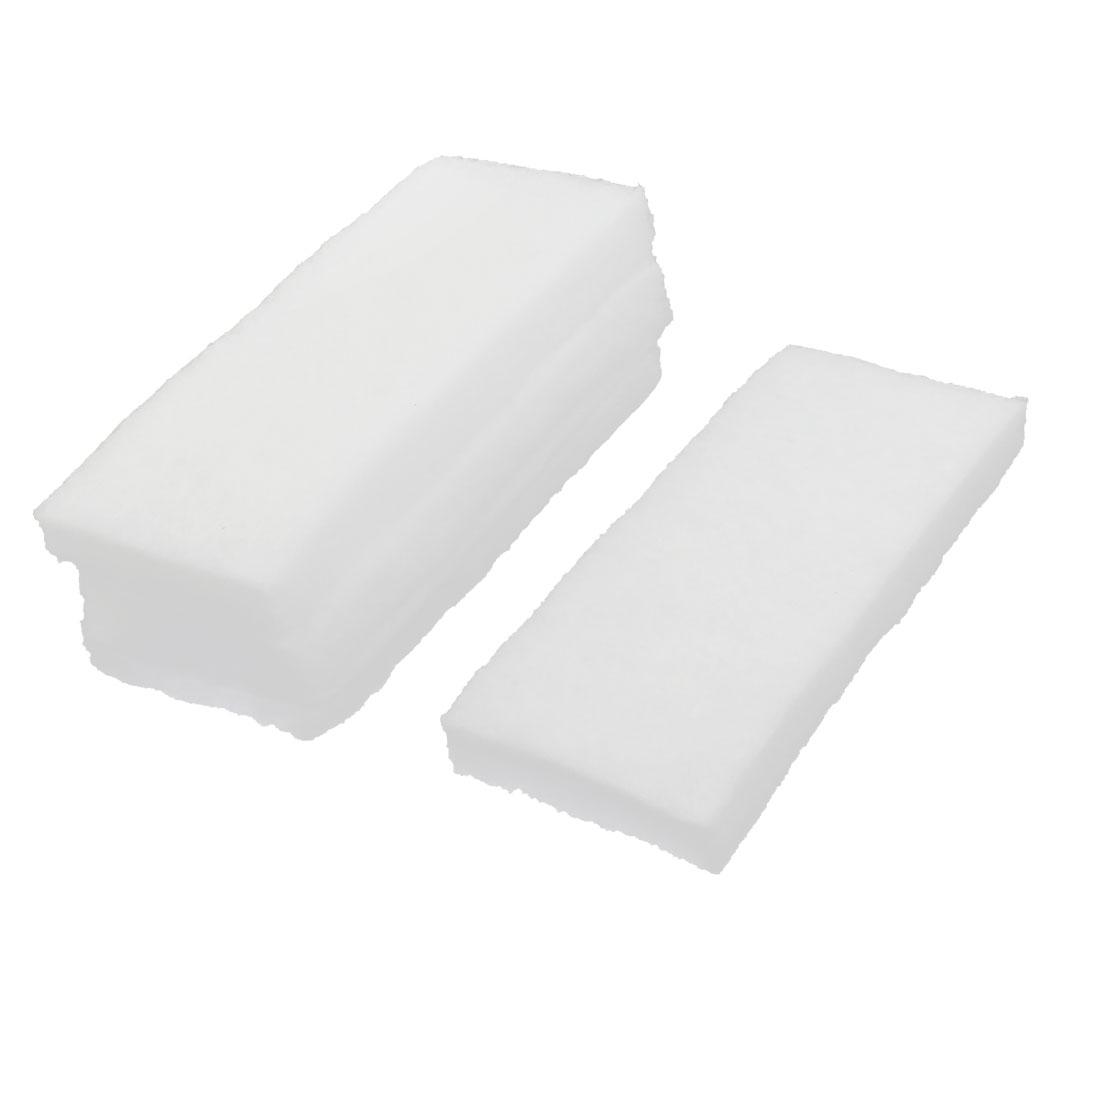 Aquarium Fresh Water Recycling Biochemical Filter Sponges White 5 Pcs